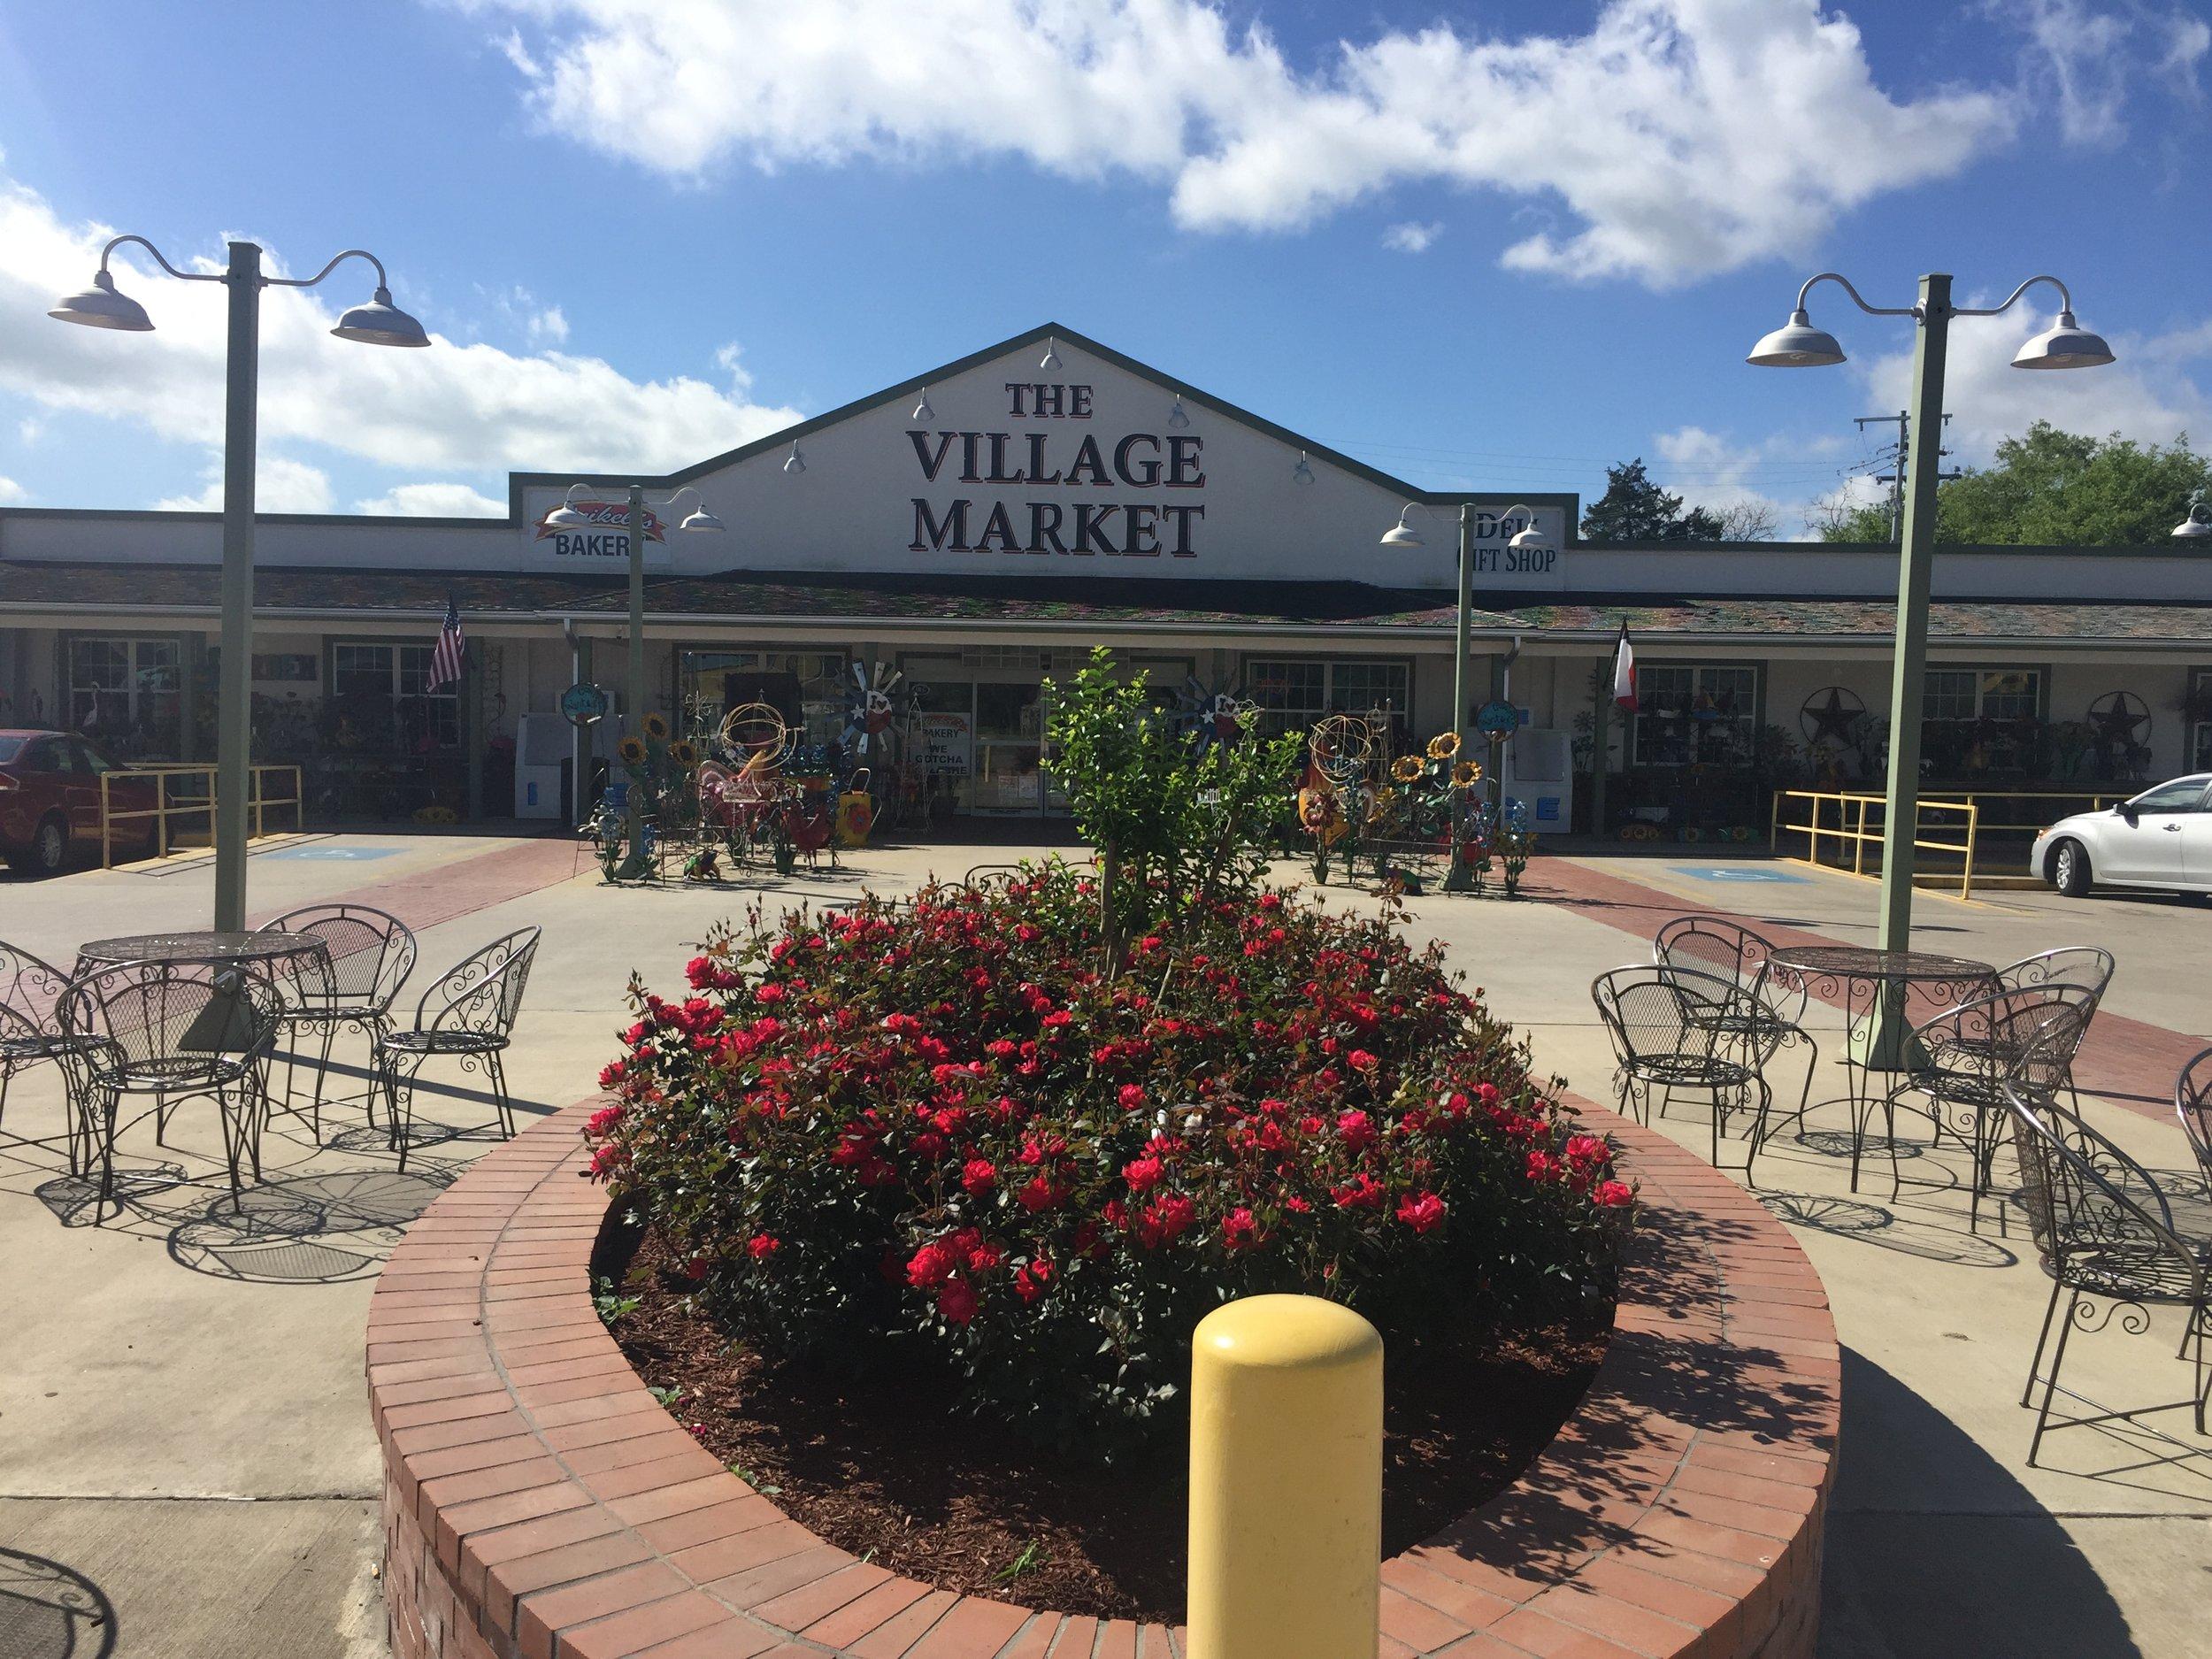 The Village Market - Jeff & Kristie WunderlichGrocery Store, Wiekels Bakery, Delicatessen, Valero fuel, Convenience store115 W Sylvan St   Carmine, Texas 78932(979) 278-3333Open Daily   Mon-Sun 7:00AM - 9:00PMCCC Member - 2017